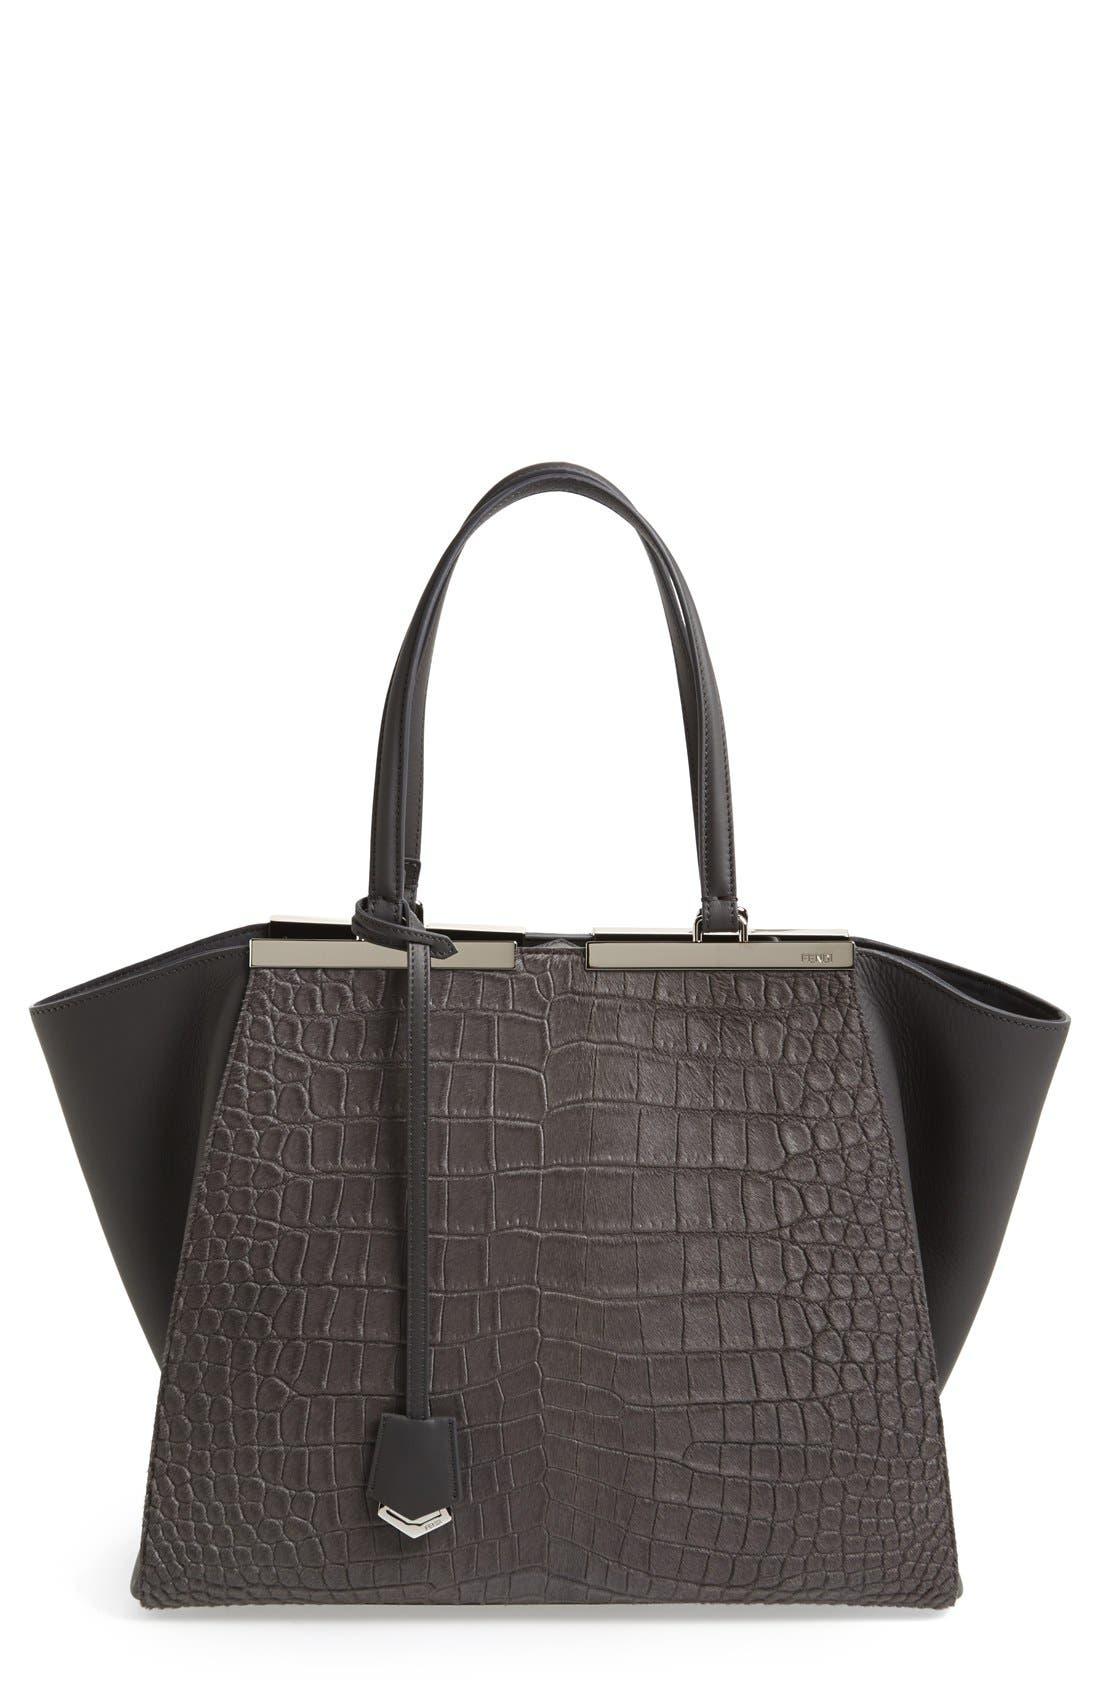 Main Image - Fendi '3Jours' Croc Embossed Leather Shopper